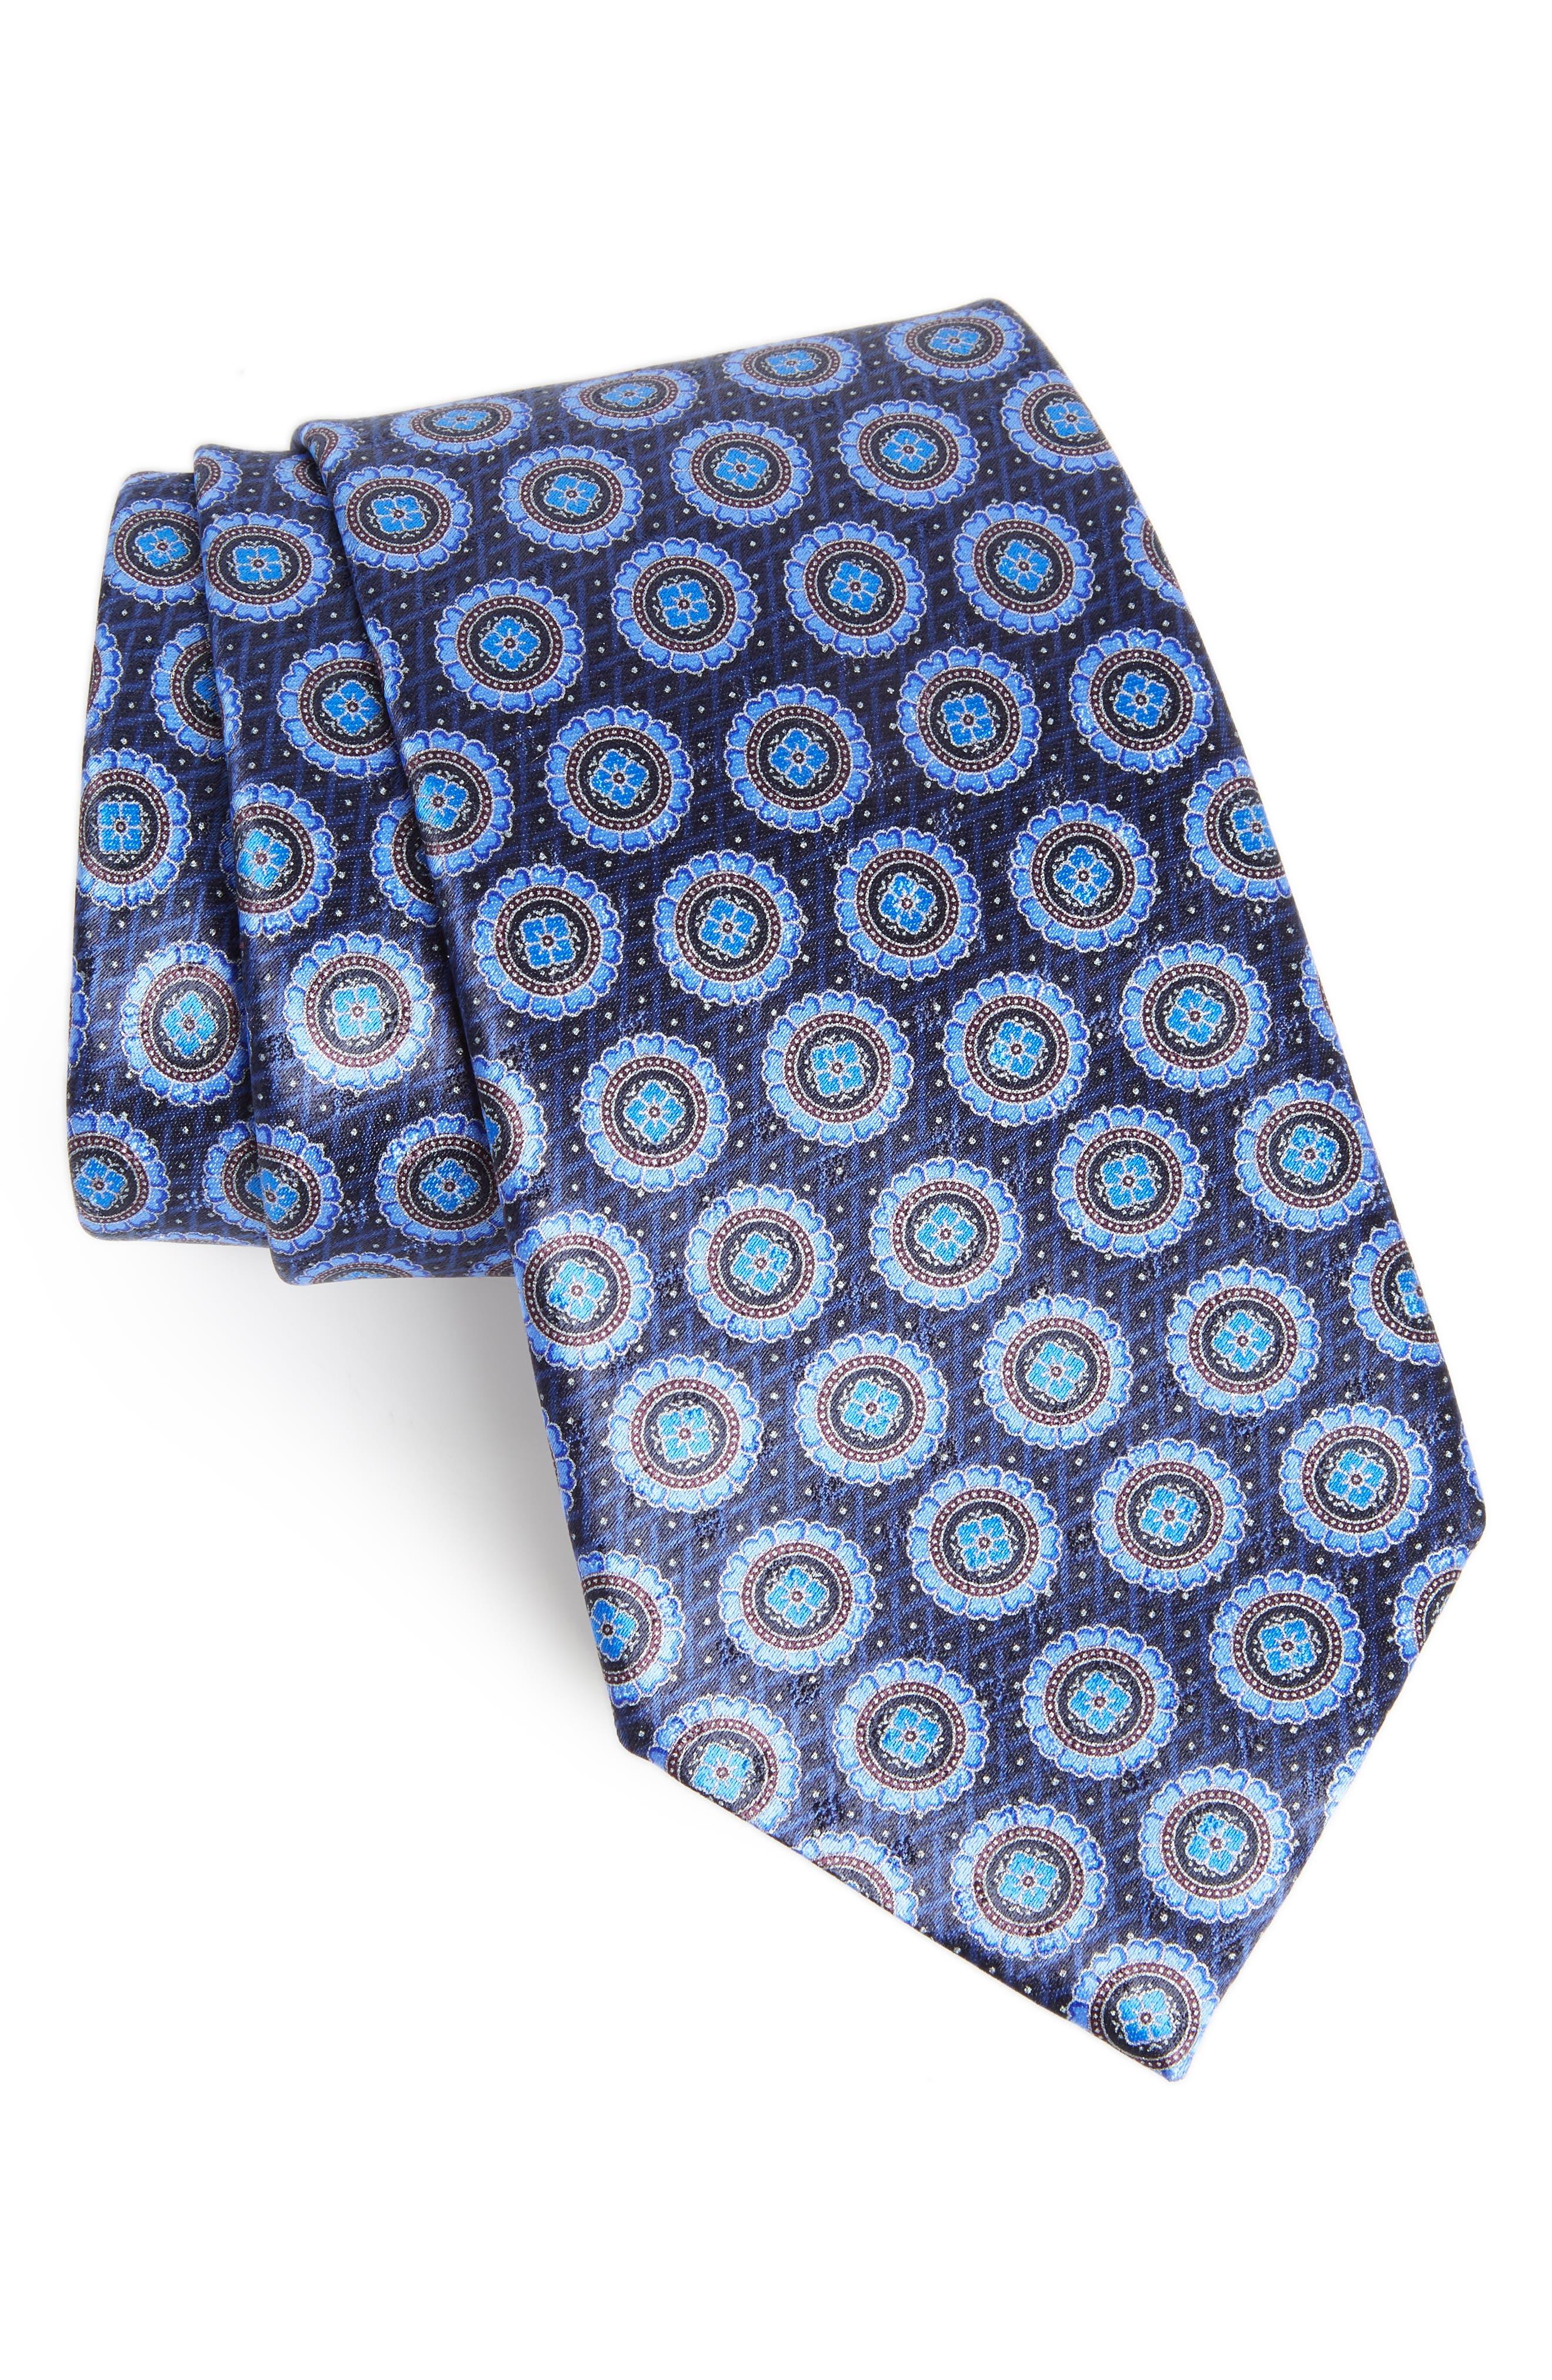 Ermenegildo Zenga Medallion Silk Tie,                         Main,                         color, BLUE